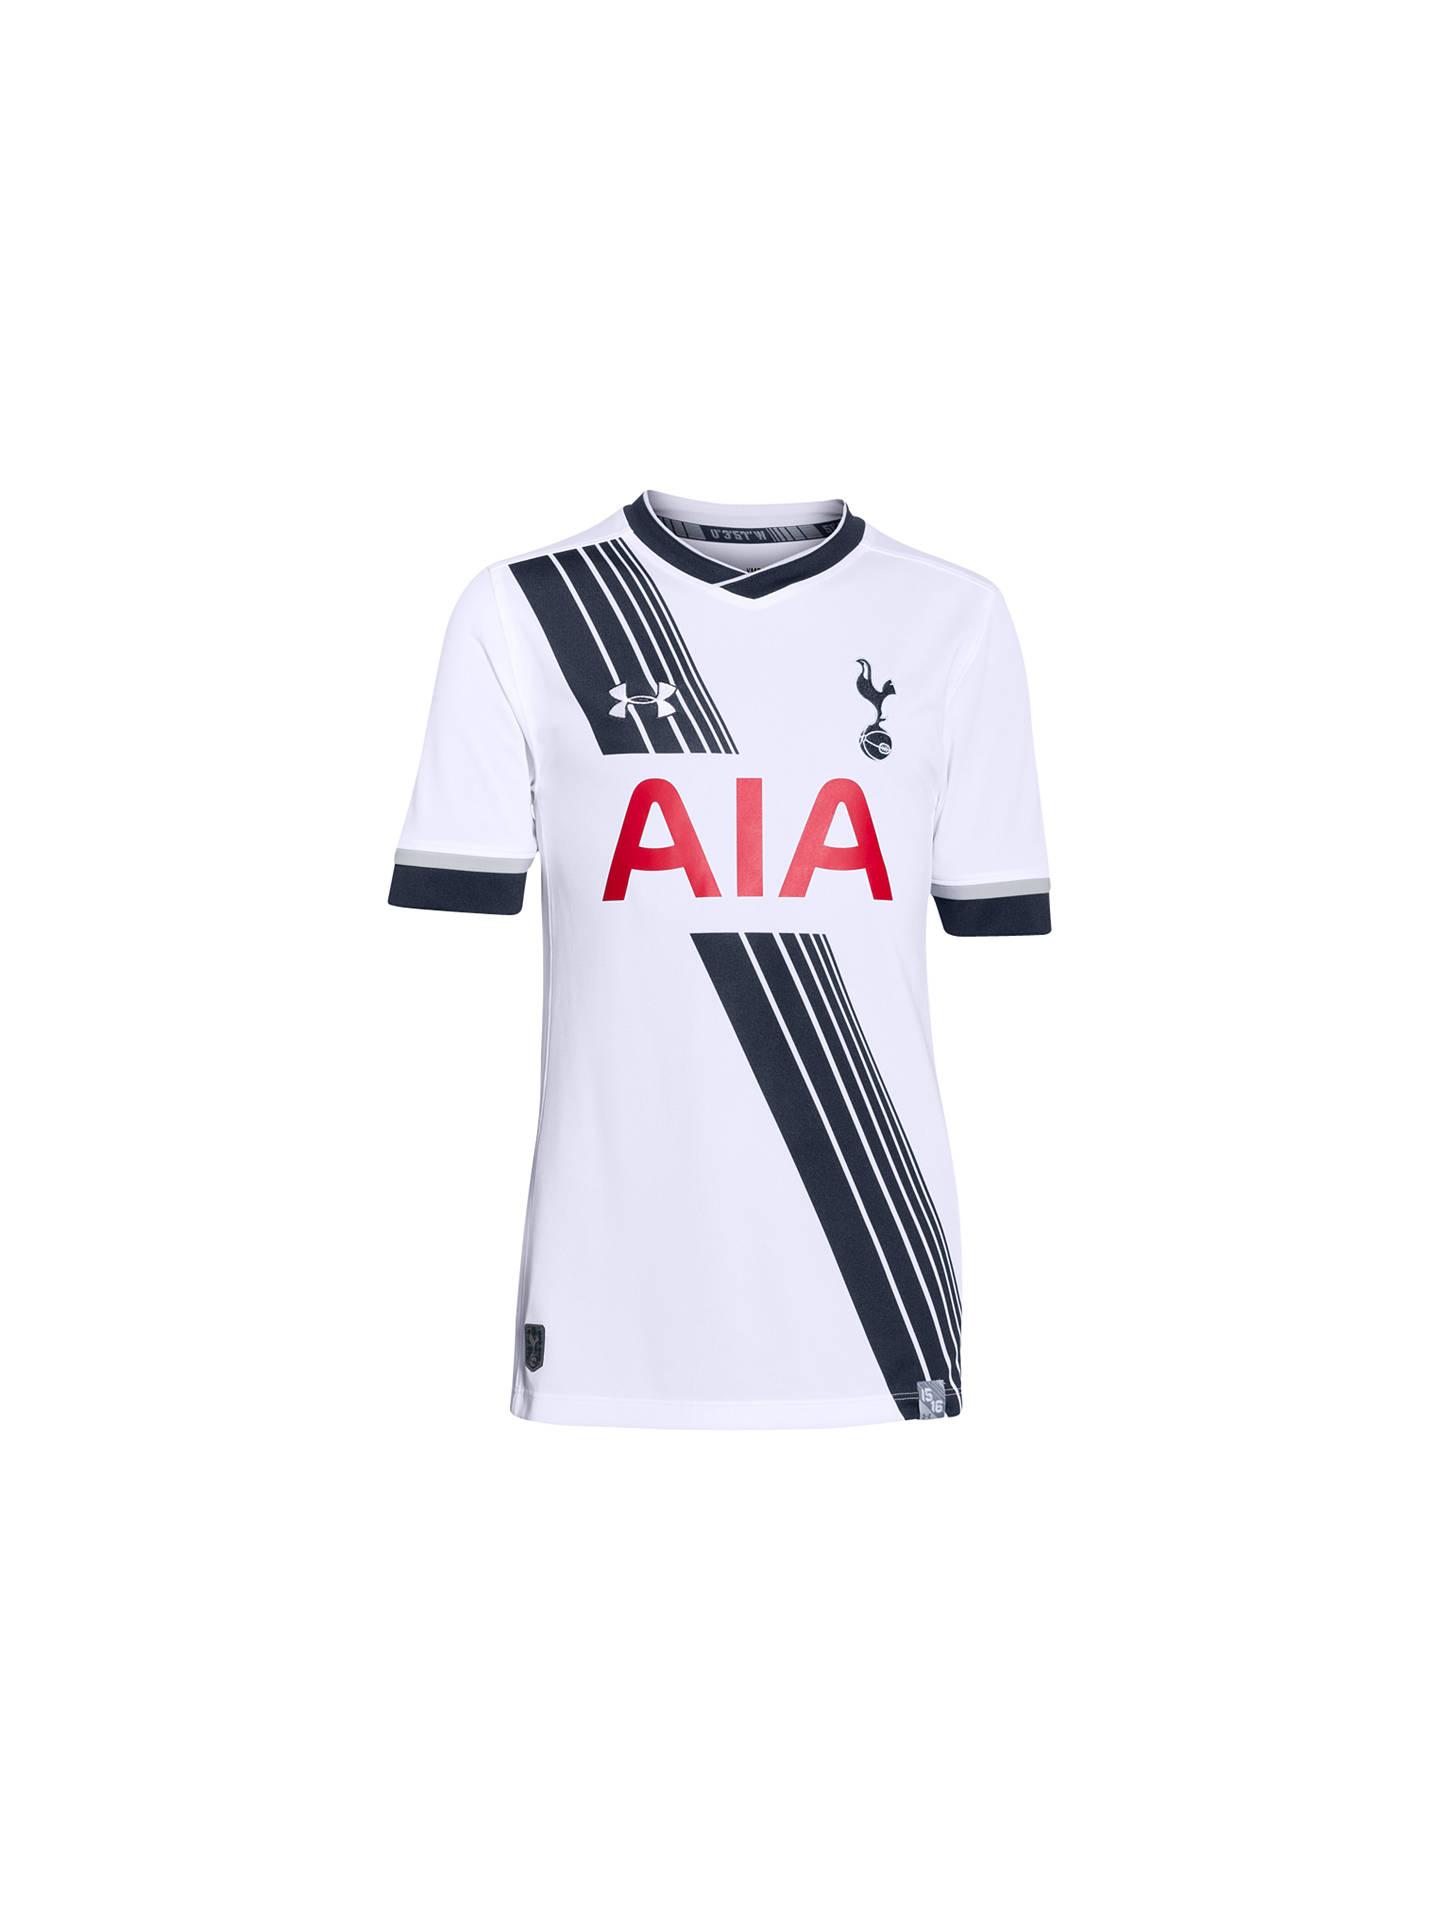 08a868cd Buy Under Armour Tottenham Hotspur 2015/16 Junior Home Shirt, White, S  Online ...